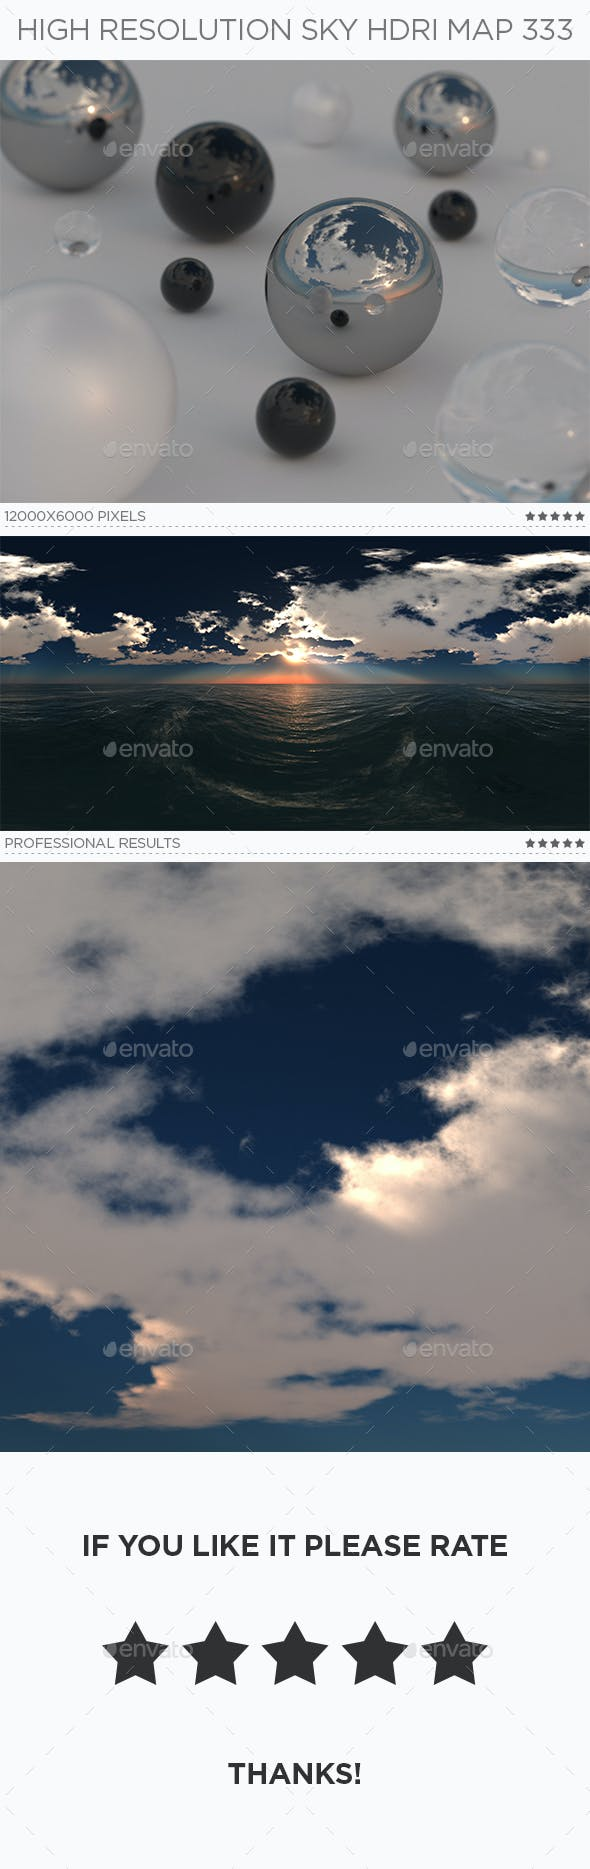 High Resolution Sky HDRi Map 333 - 3DOcean Item for Sale